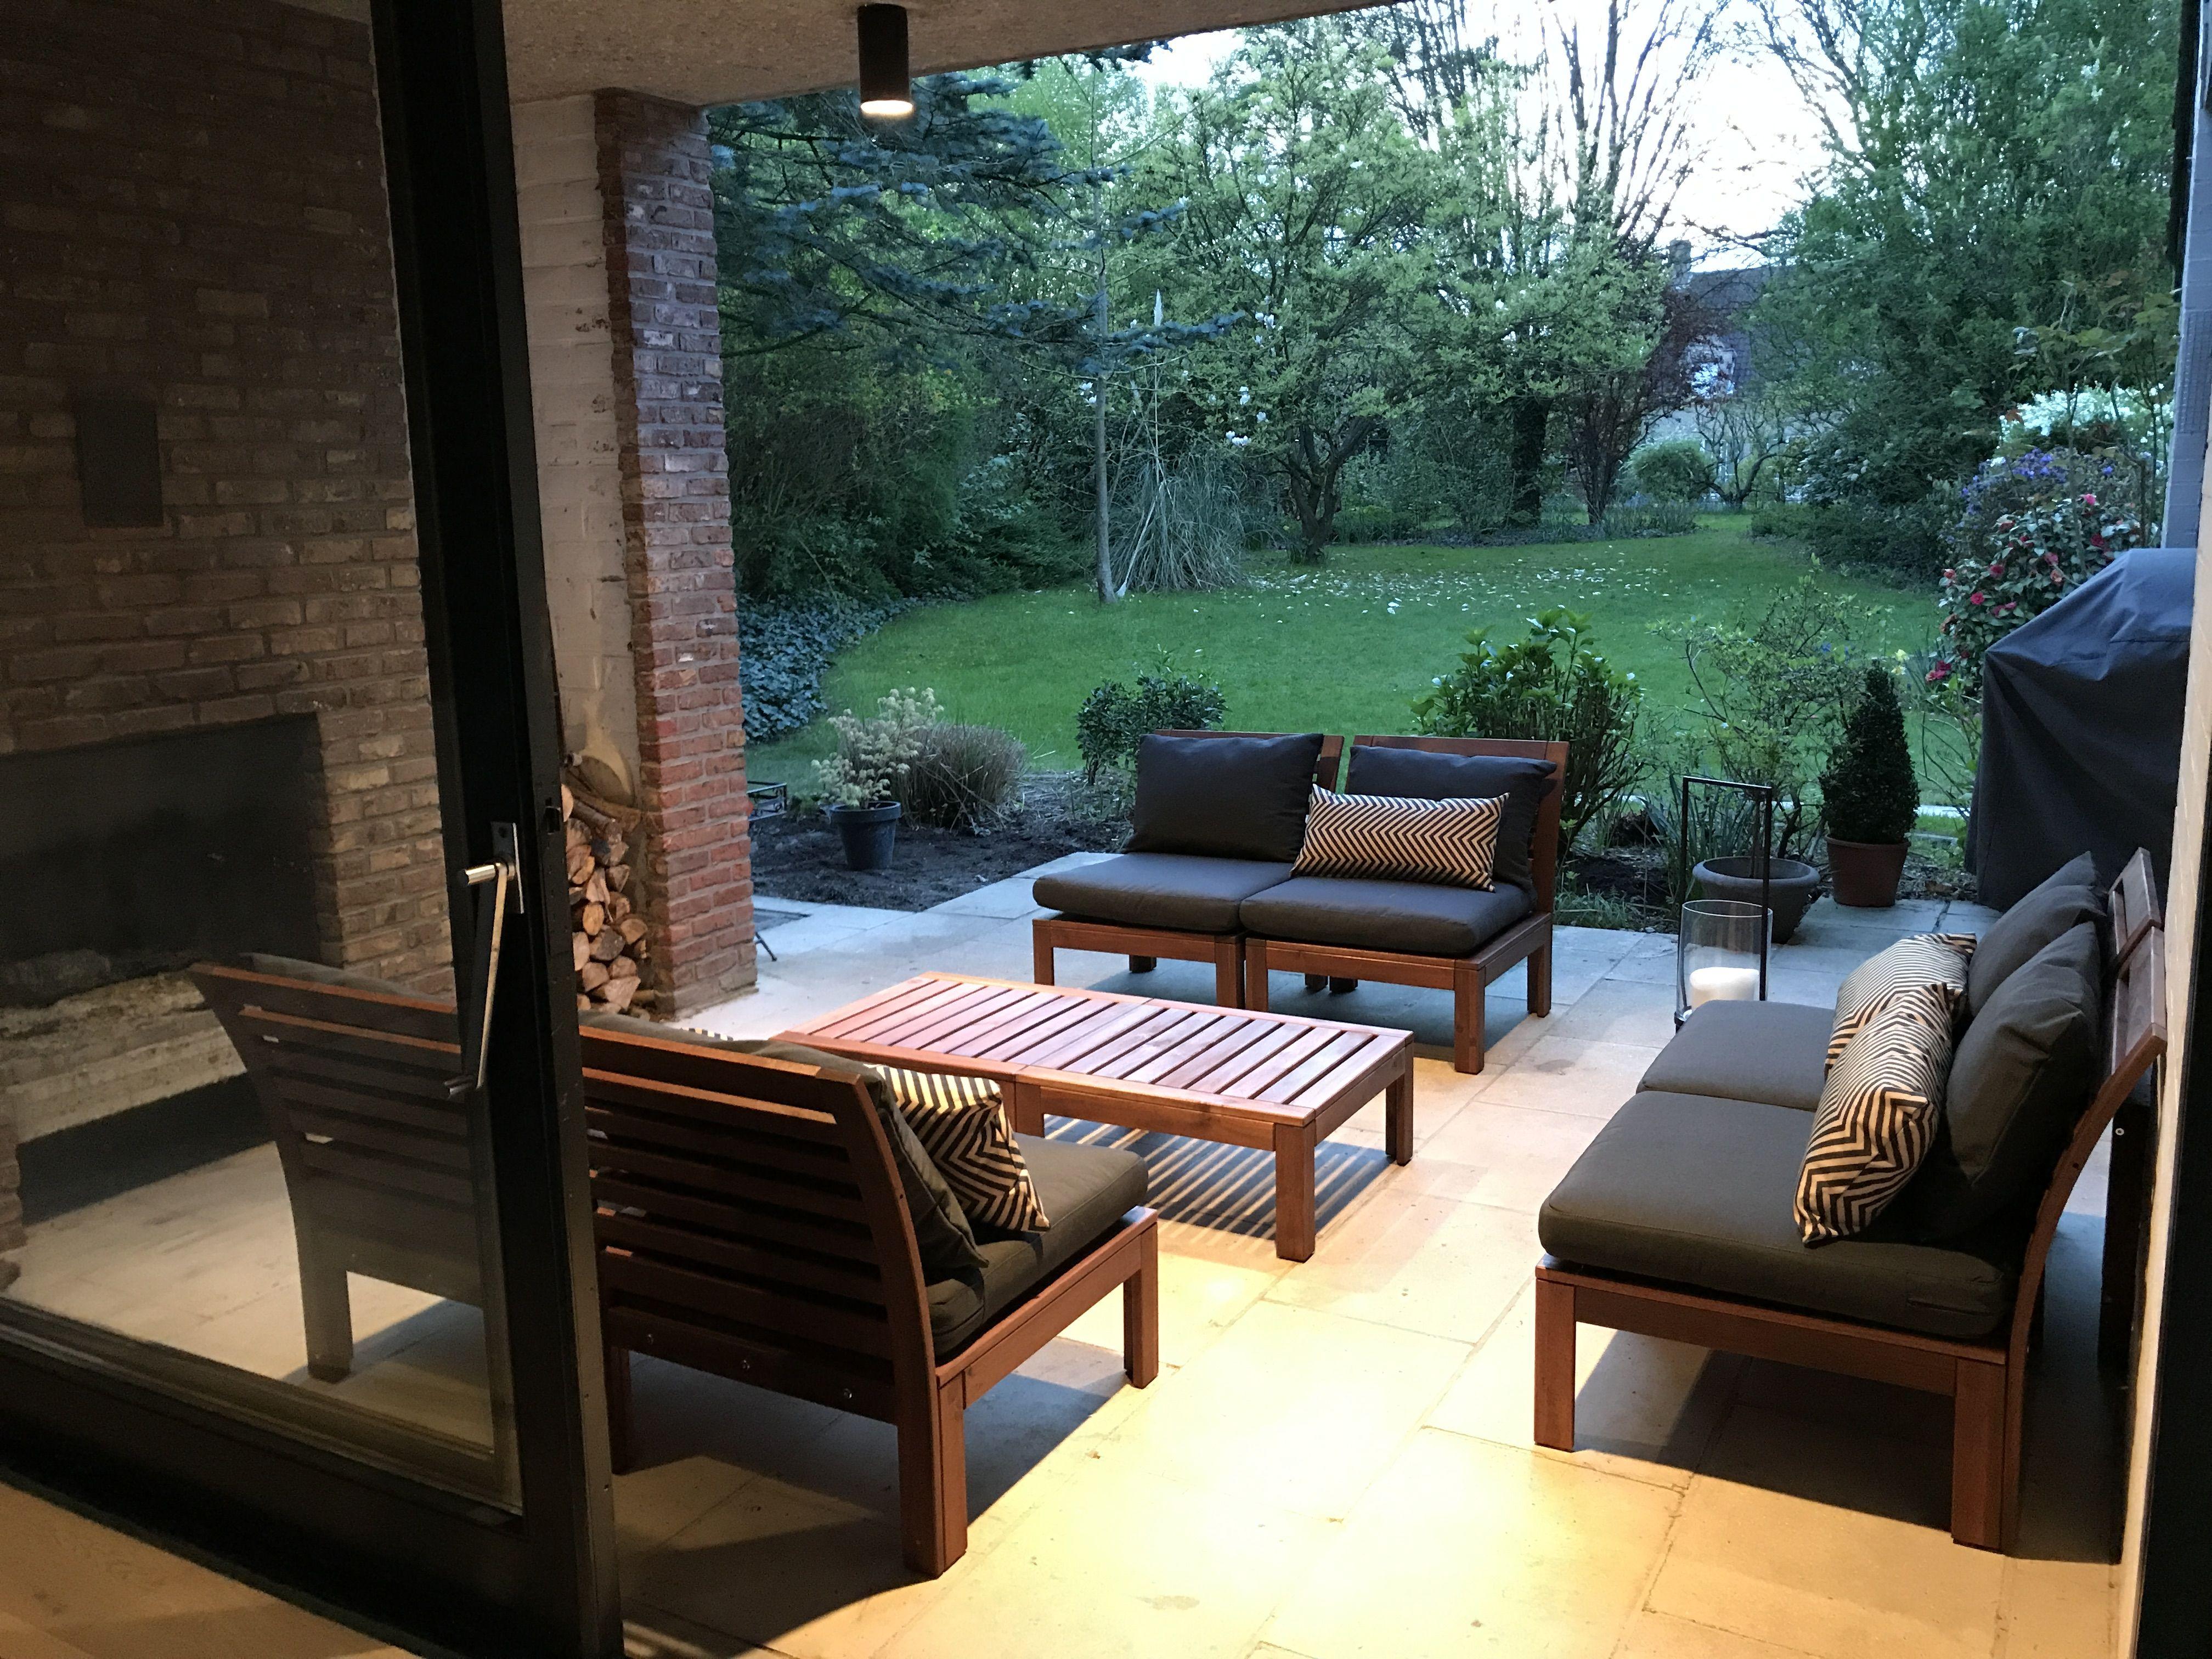 Ikea Applaro summer 2107 terrasse & jardin in 2019